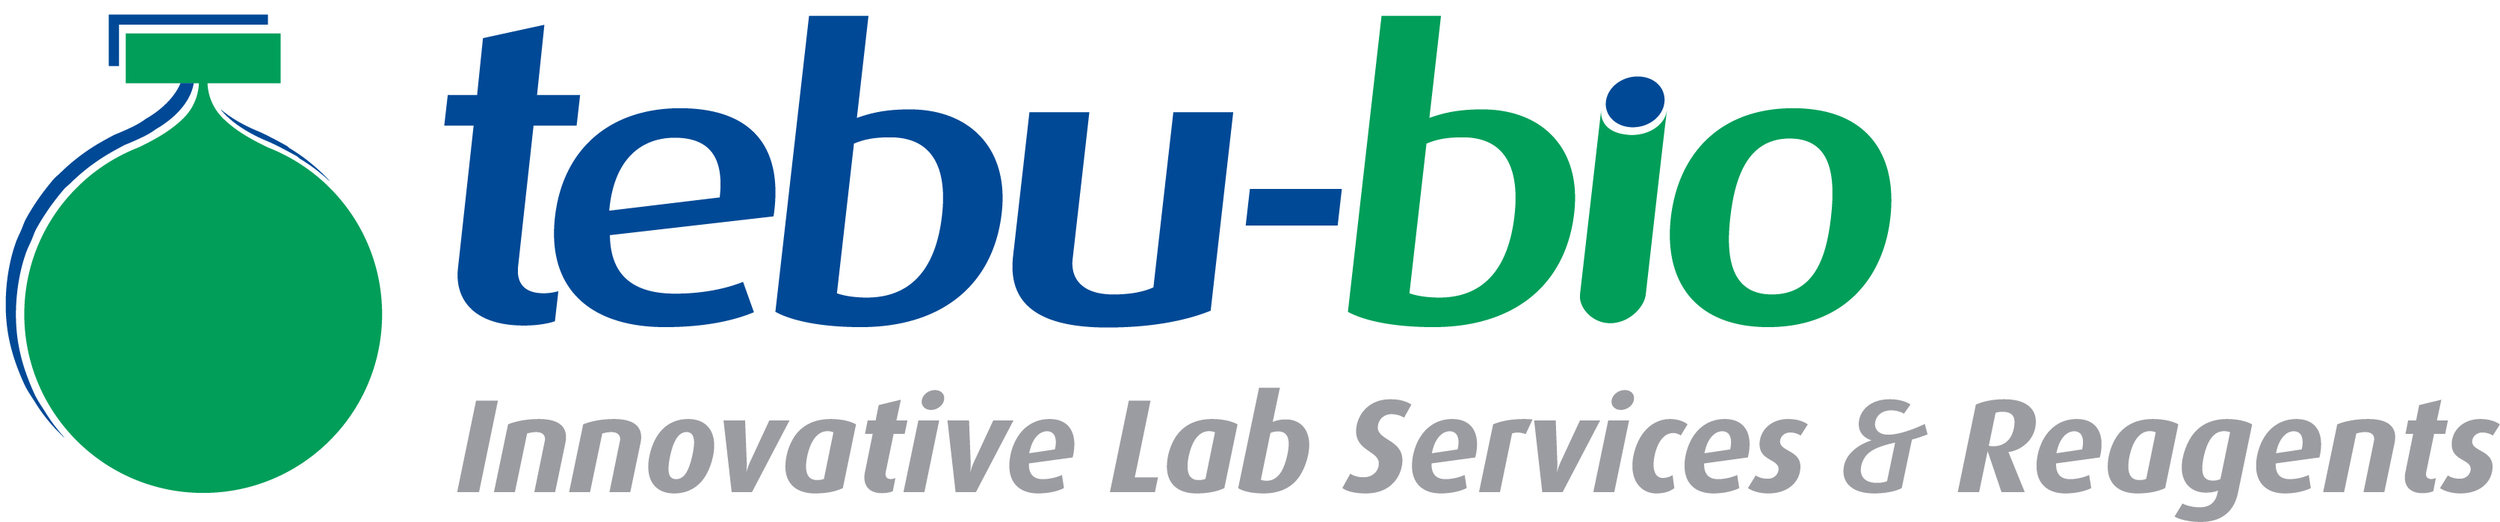 tebu-bio Germany - Berliner Str. 255D-63067 OffenbachGermanyTel: +49 (069) 801013-0Fax: +49 (069) 801013-20Website: www.tebu-bio.com